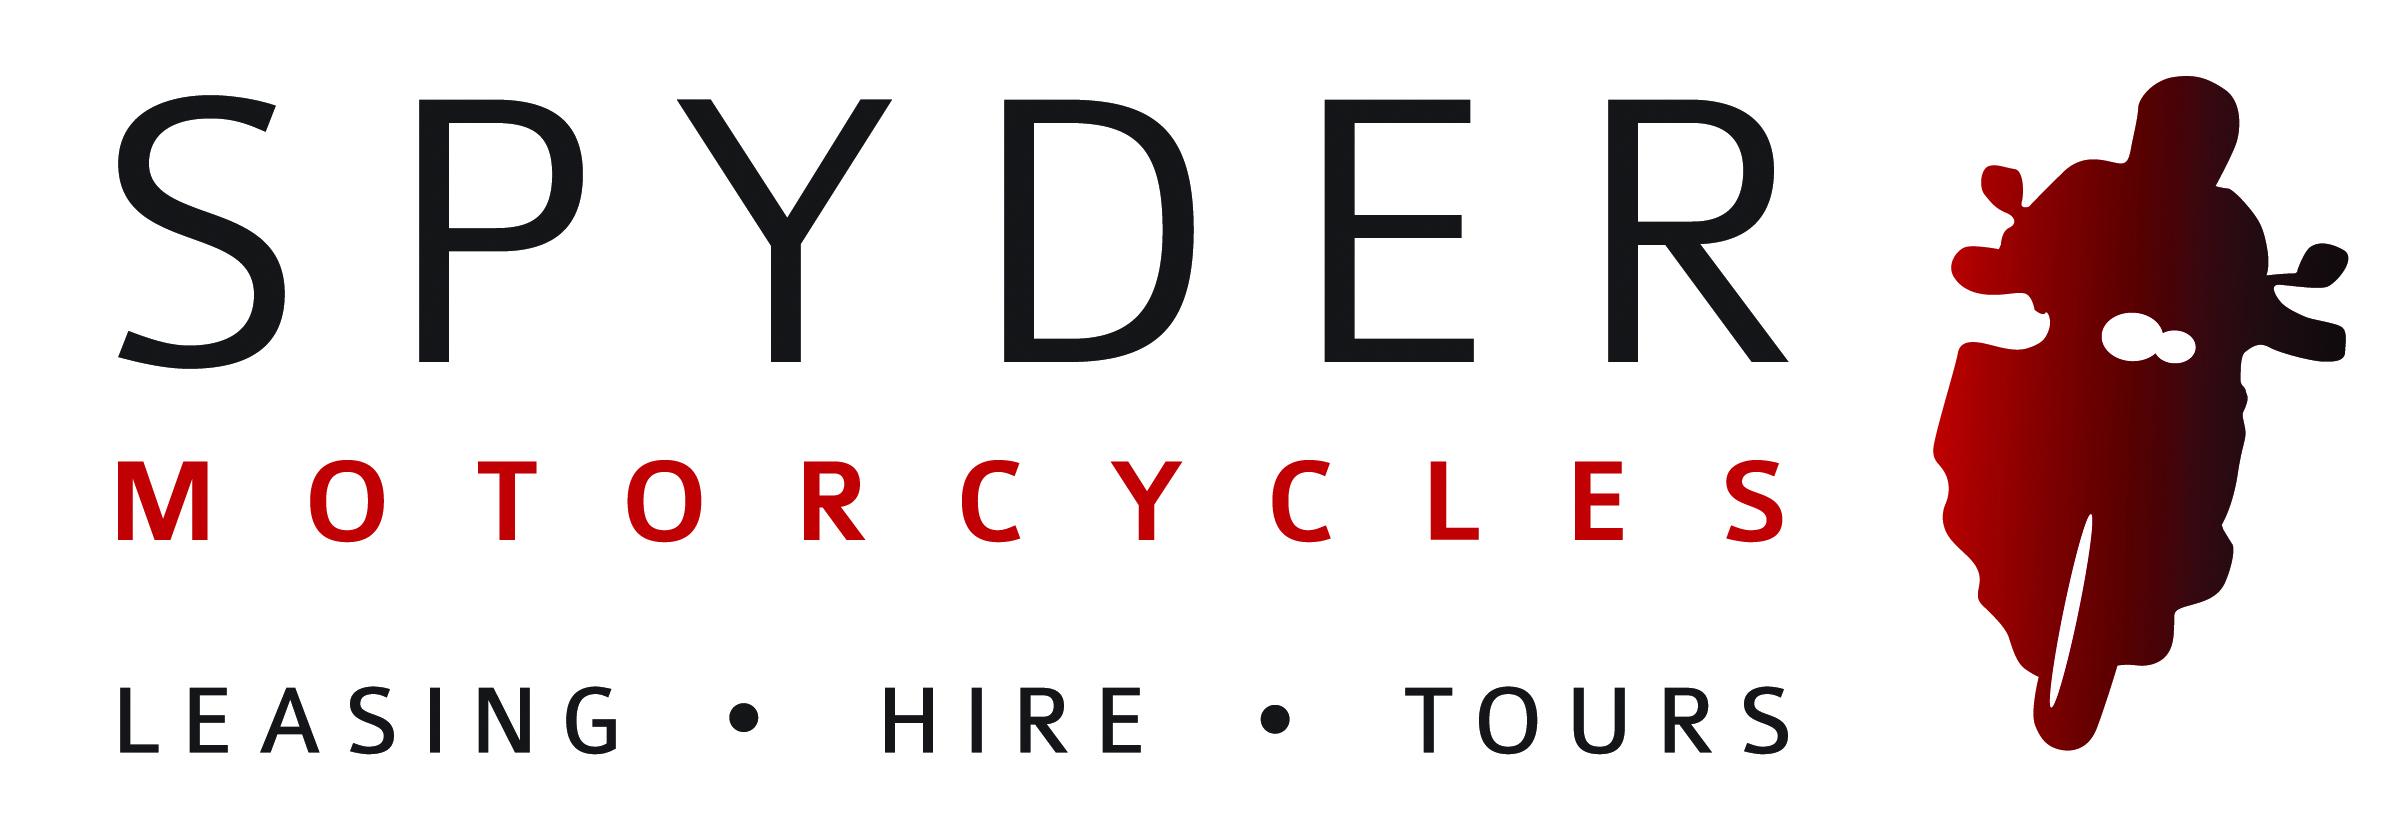 Spyder Motorcycles logo